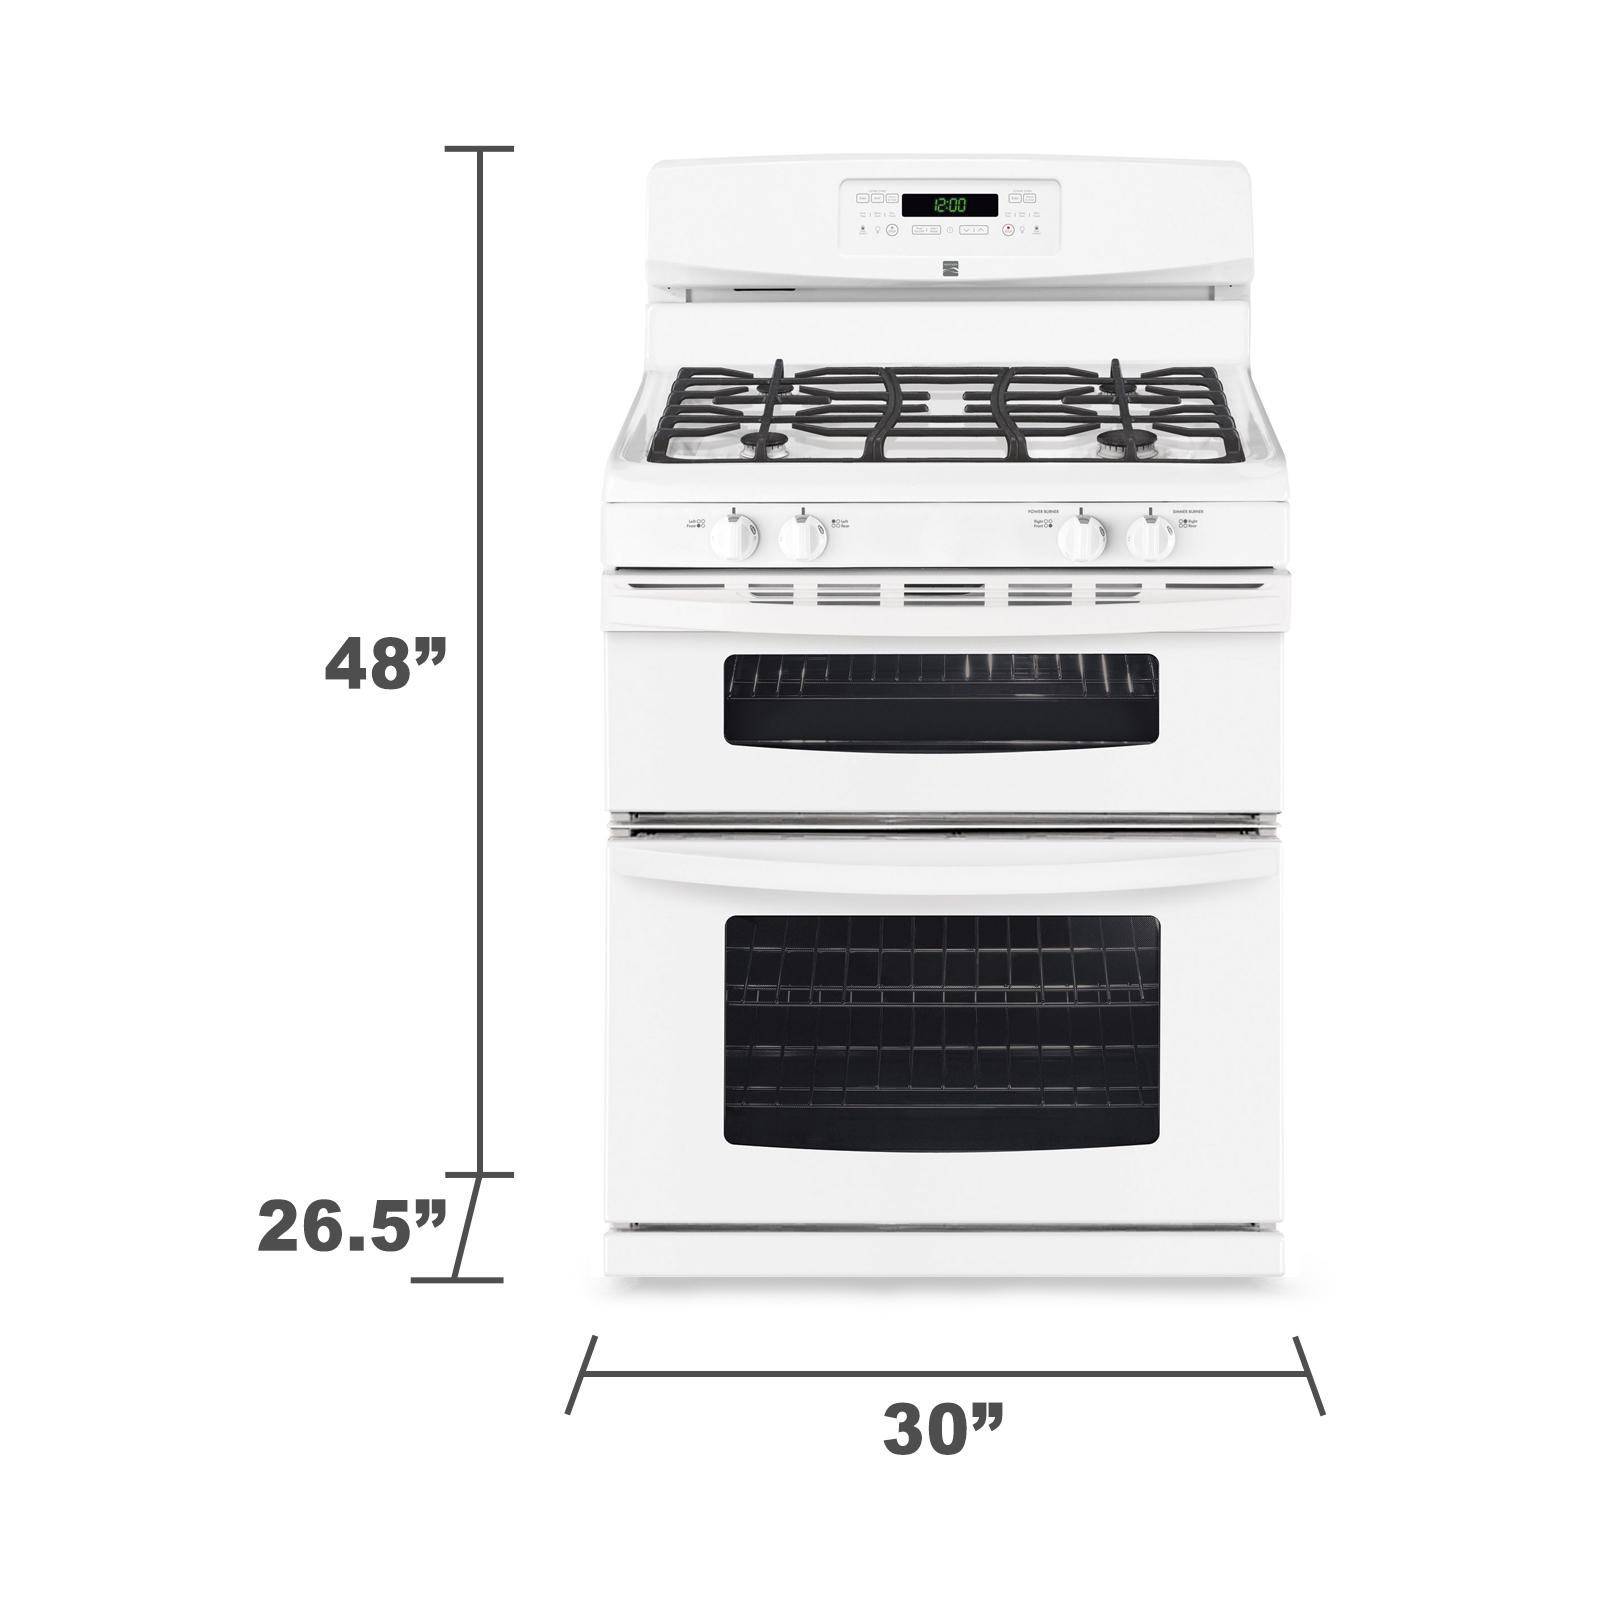 Kenmore 5.8 cu. ft. Double-Oven Gas Range